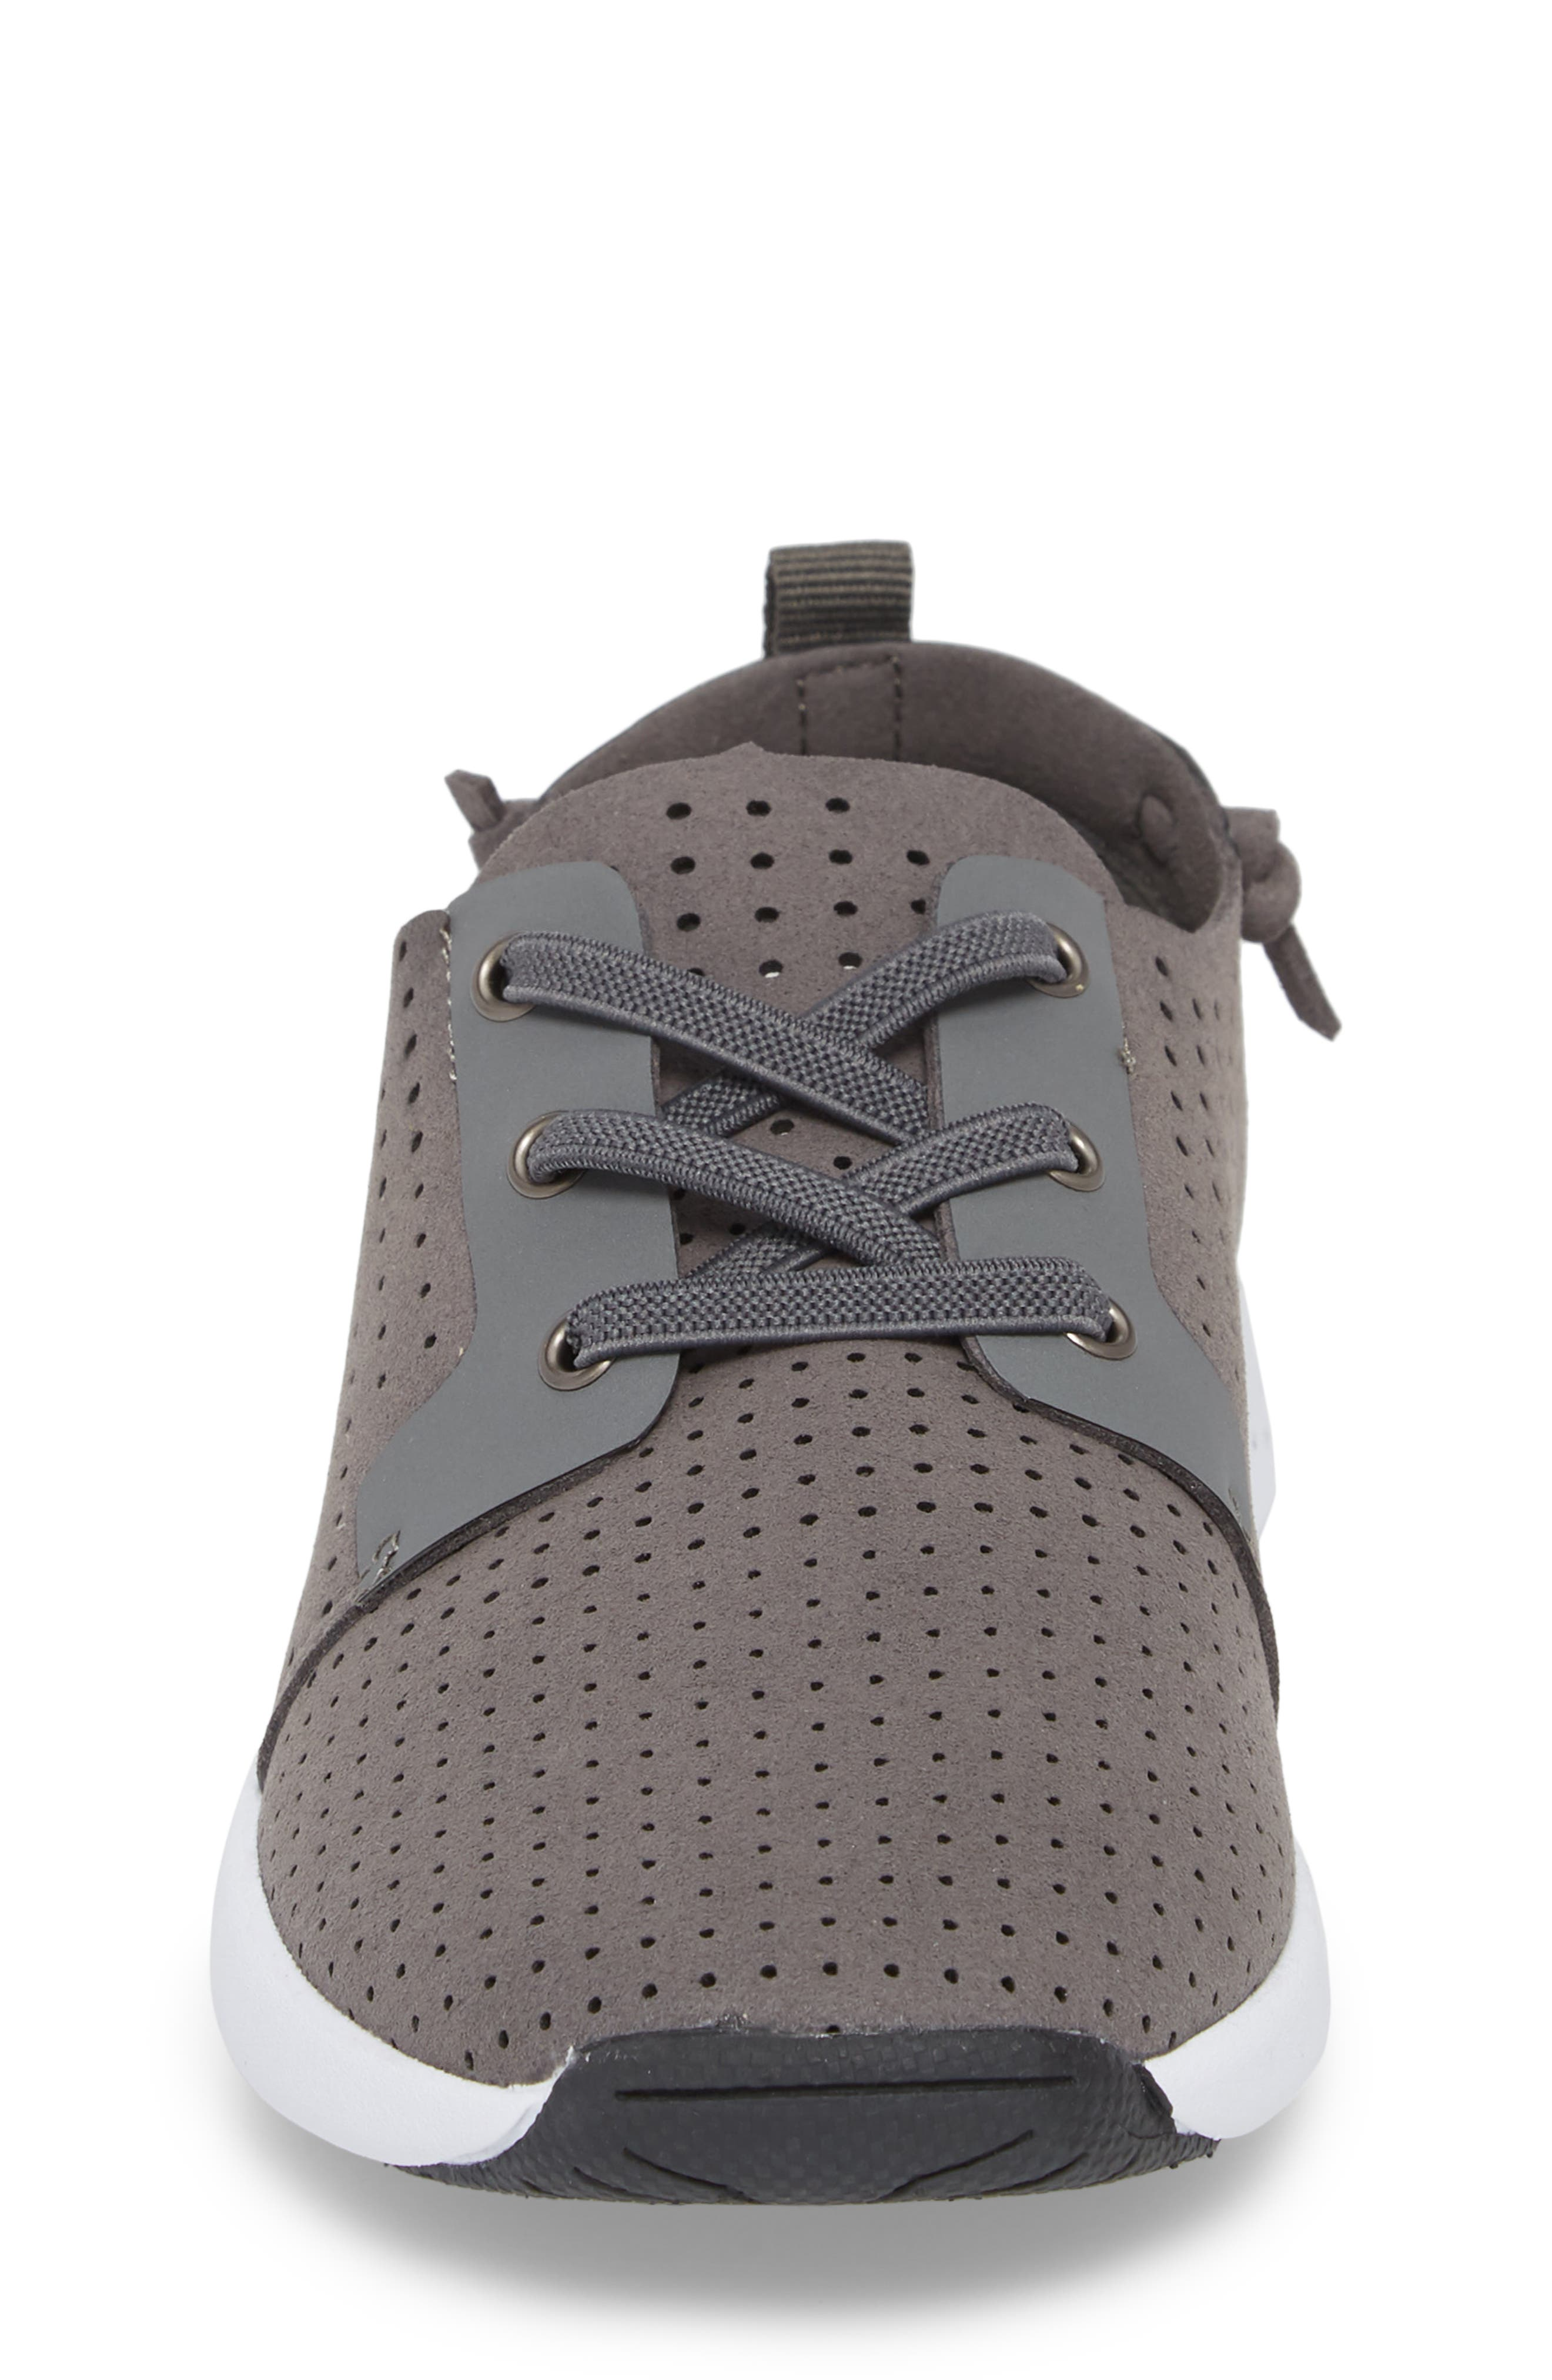 Brixxon Perforated Sneaker,                             Alternate thumbnail 4, color,                             Grey